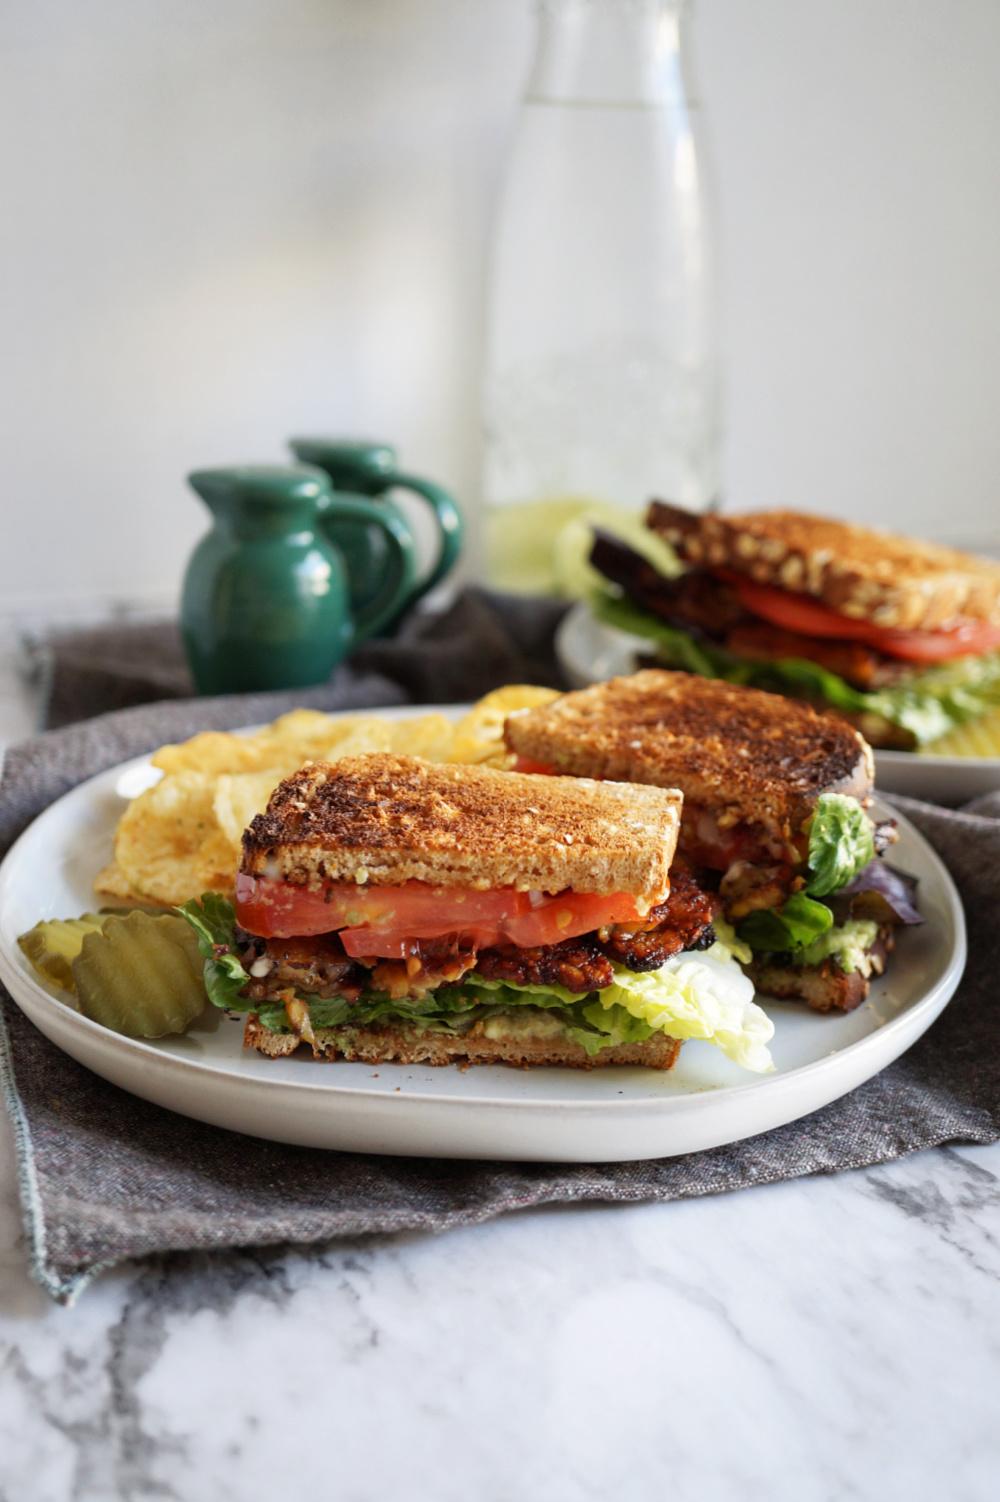 vegan BLT sandwich on a plate cut in half